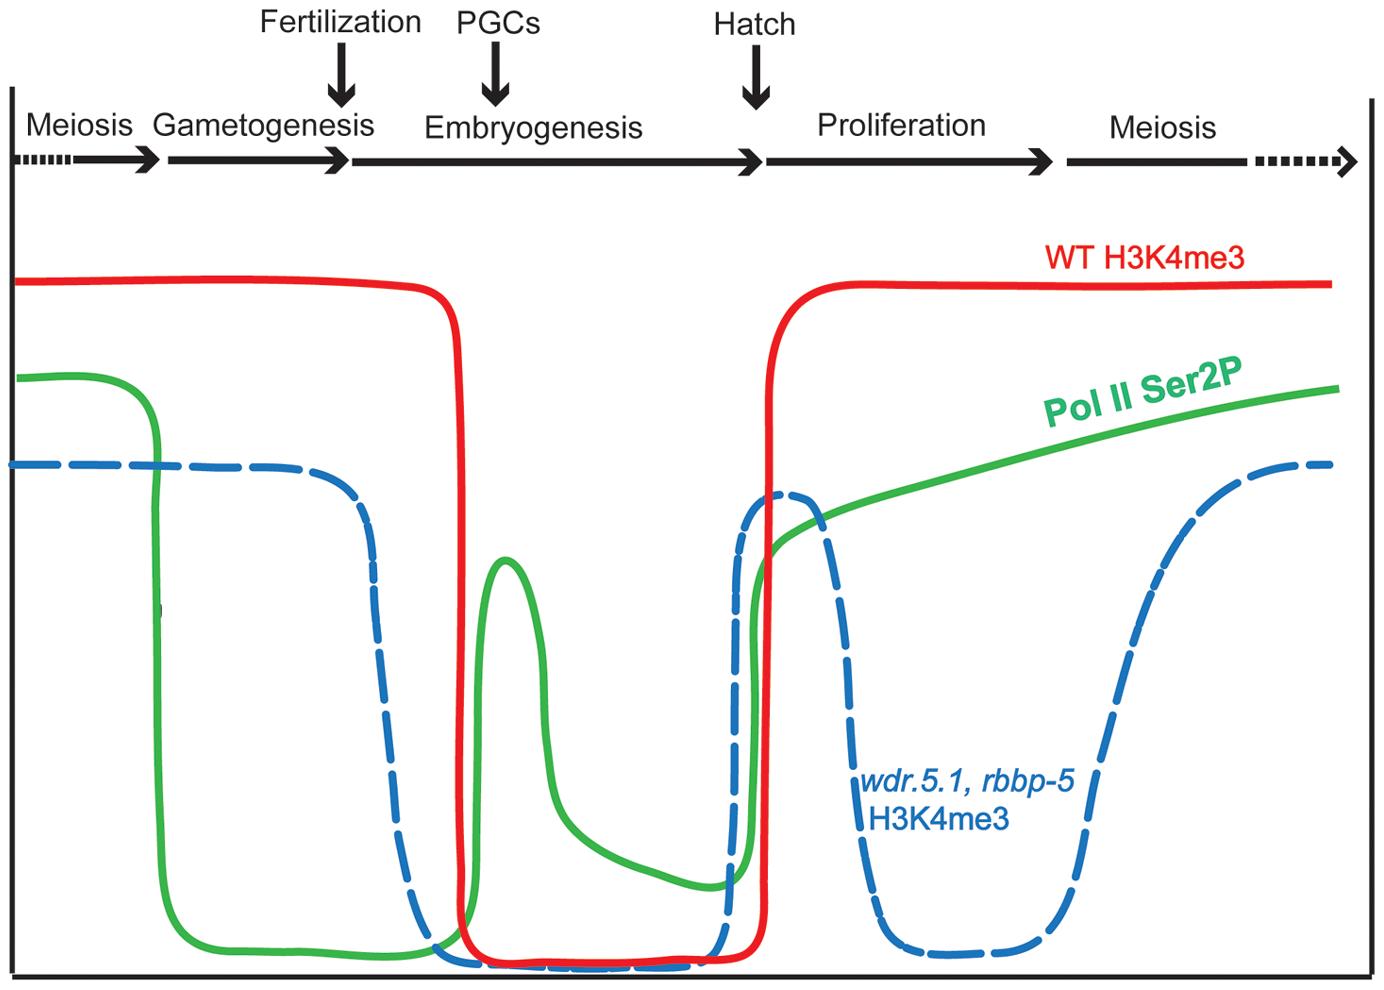 Summary of H3K4me3 and RNA polymerase C-terminal domain phosphorylation dynamics during the <i>C.</i><i> elegans</i> germline cycle.